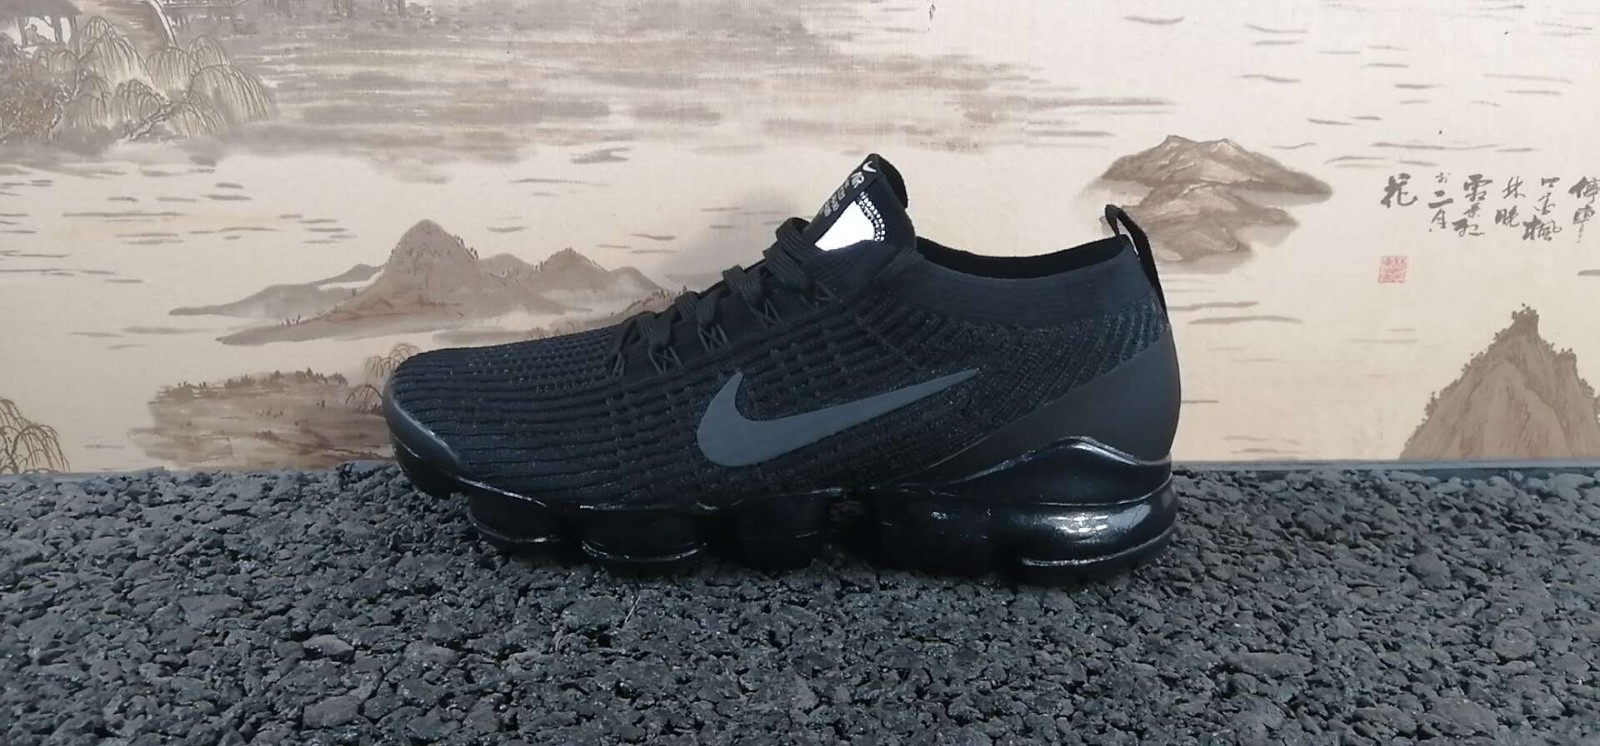 nike air vapormax flyknit 3 mens black grey blue shoes